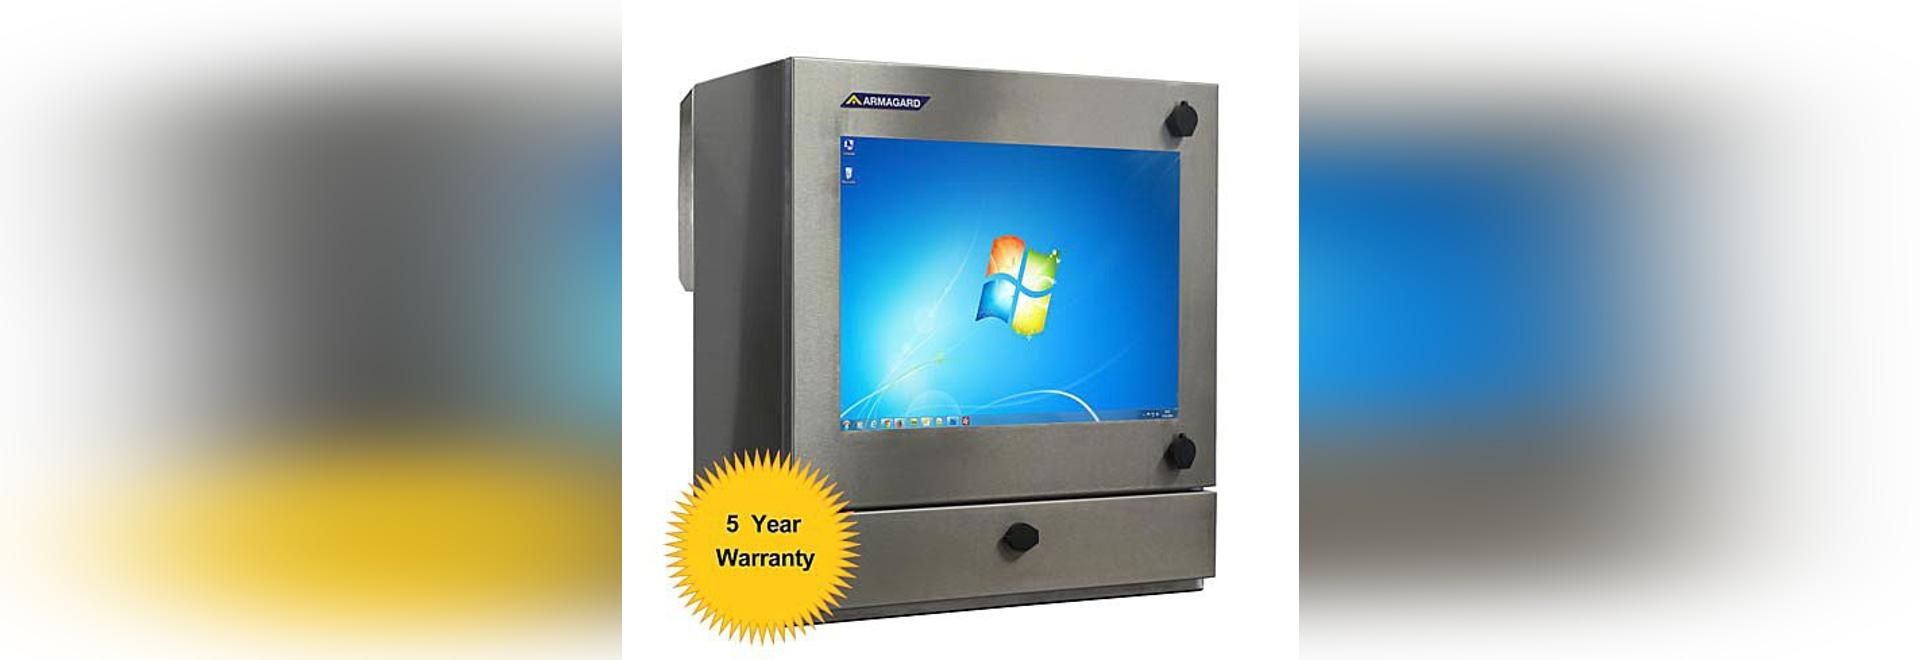 SENC-400 Waterproof Industrial Computer Enclosure – Watertight PC Protection for Wash Down Facilities